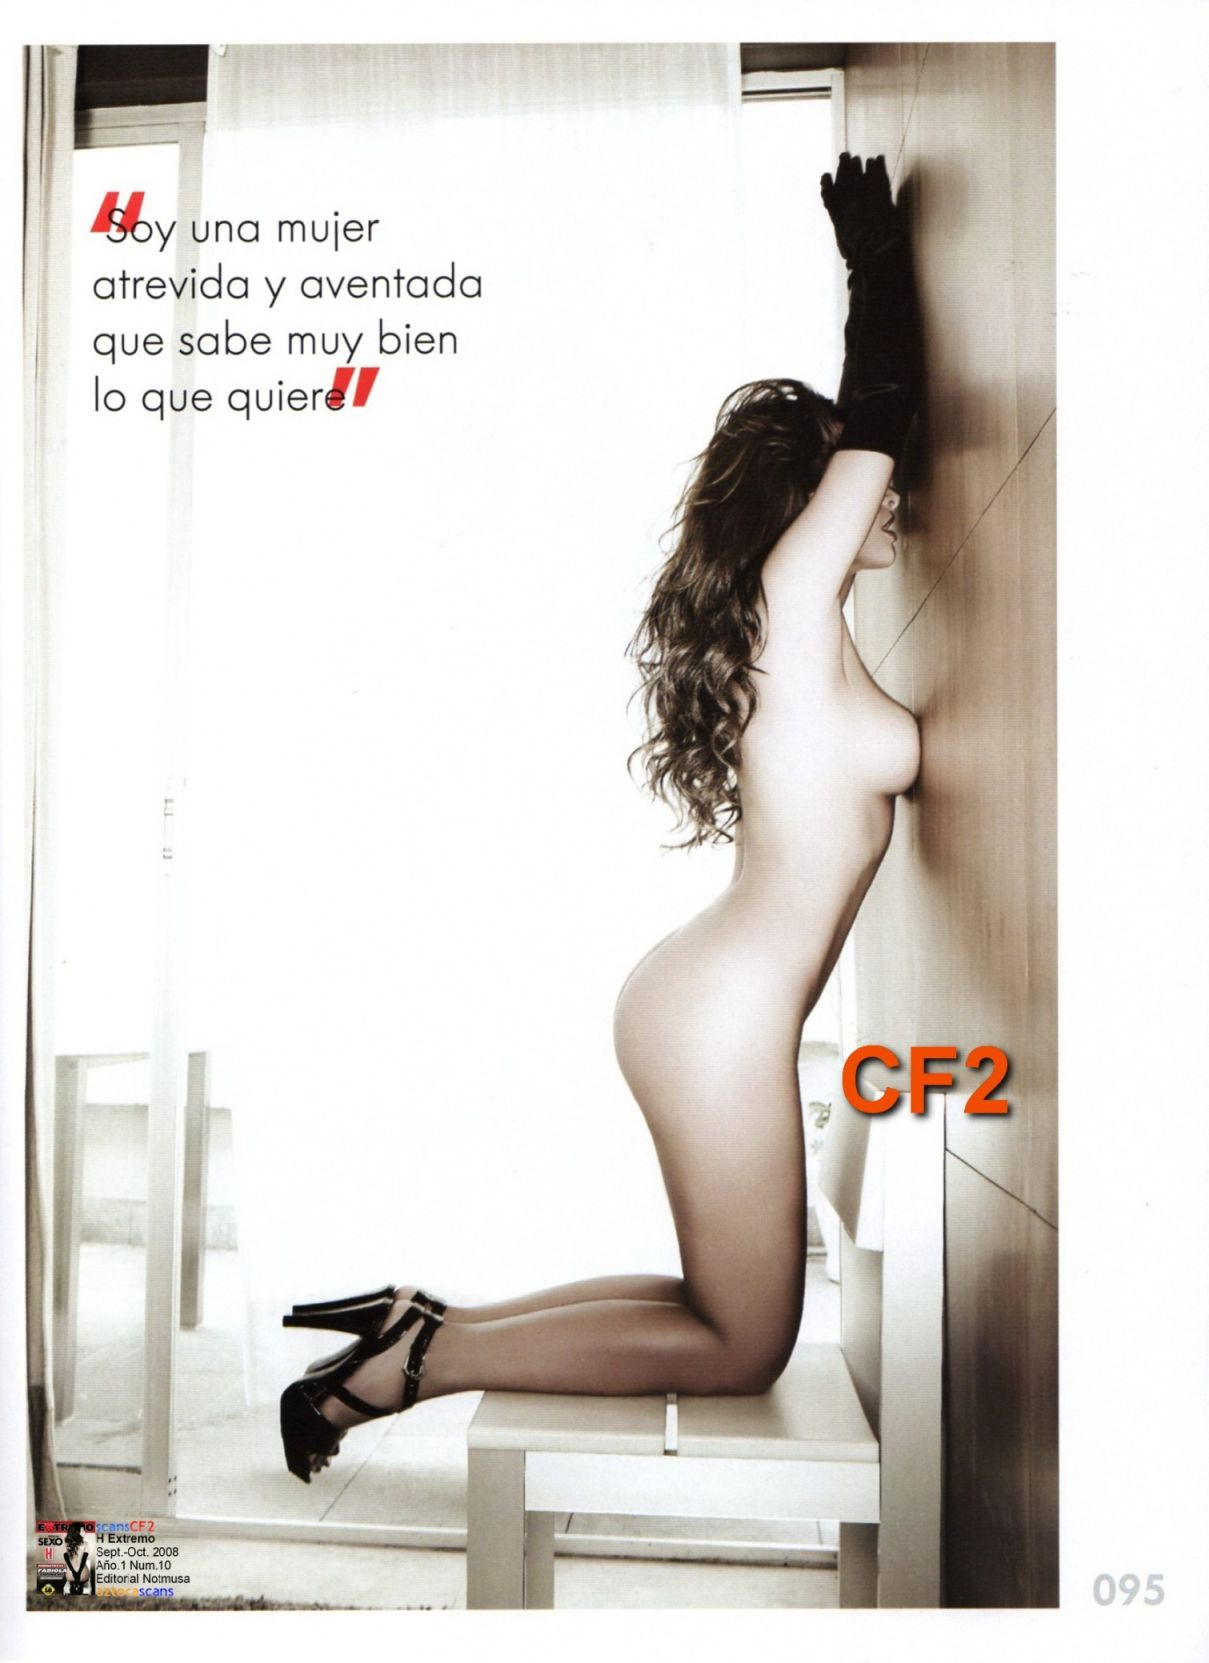 10346_FFM_CF2_508_123_1171lo.JPG